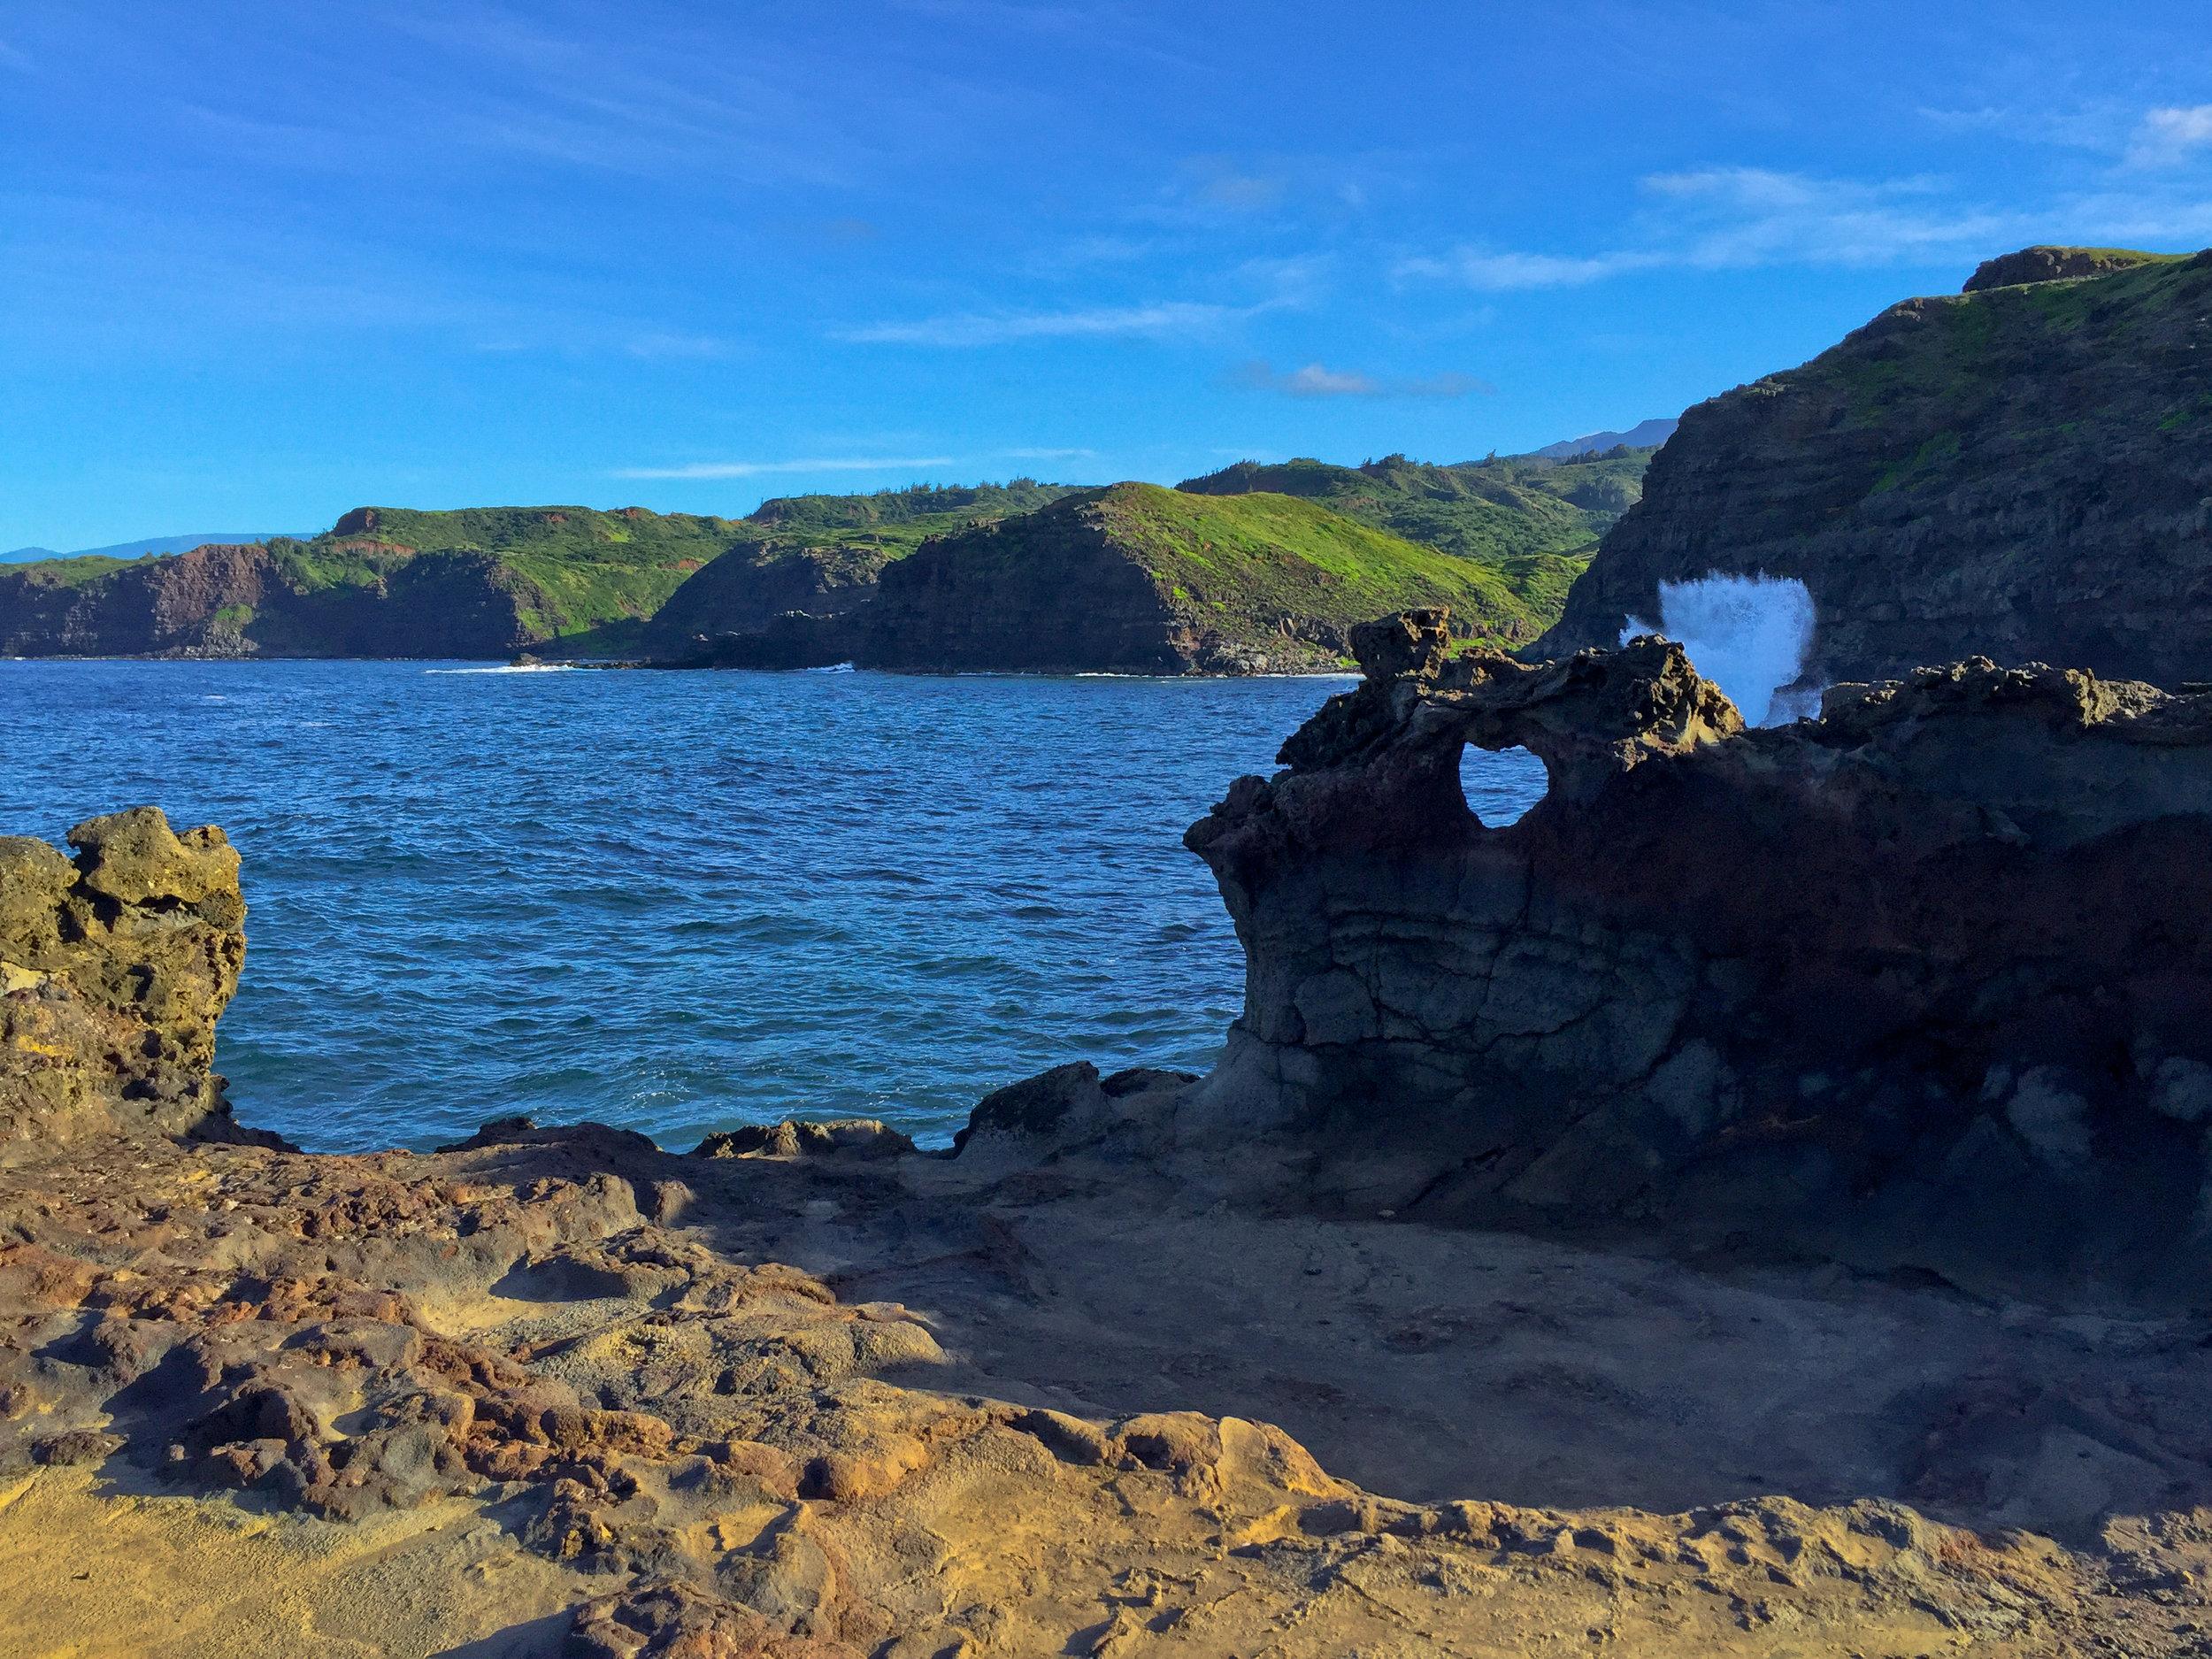 Heart Rock at the Nakalele Blowhole in Maui, Hawaii